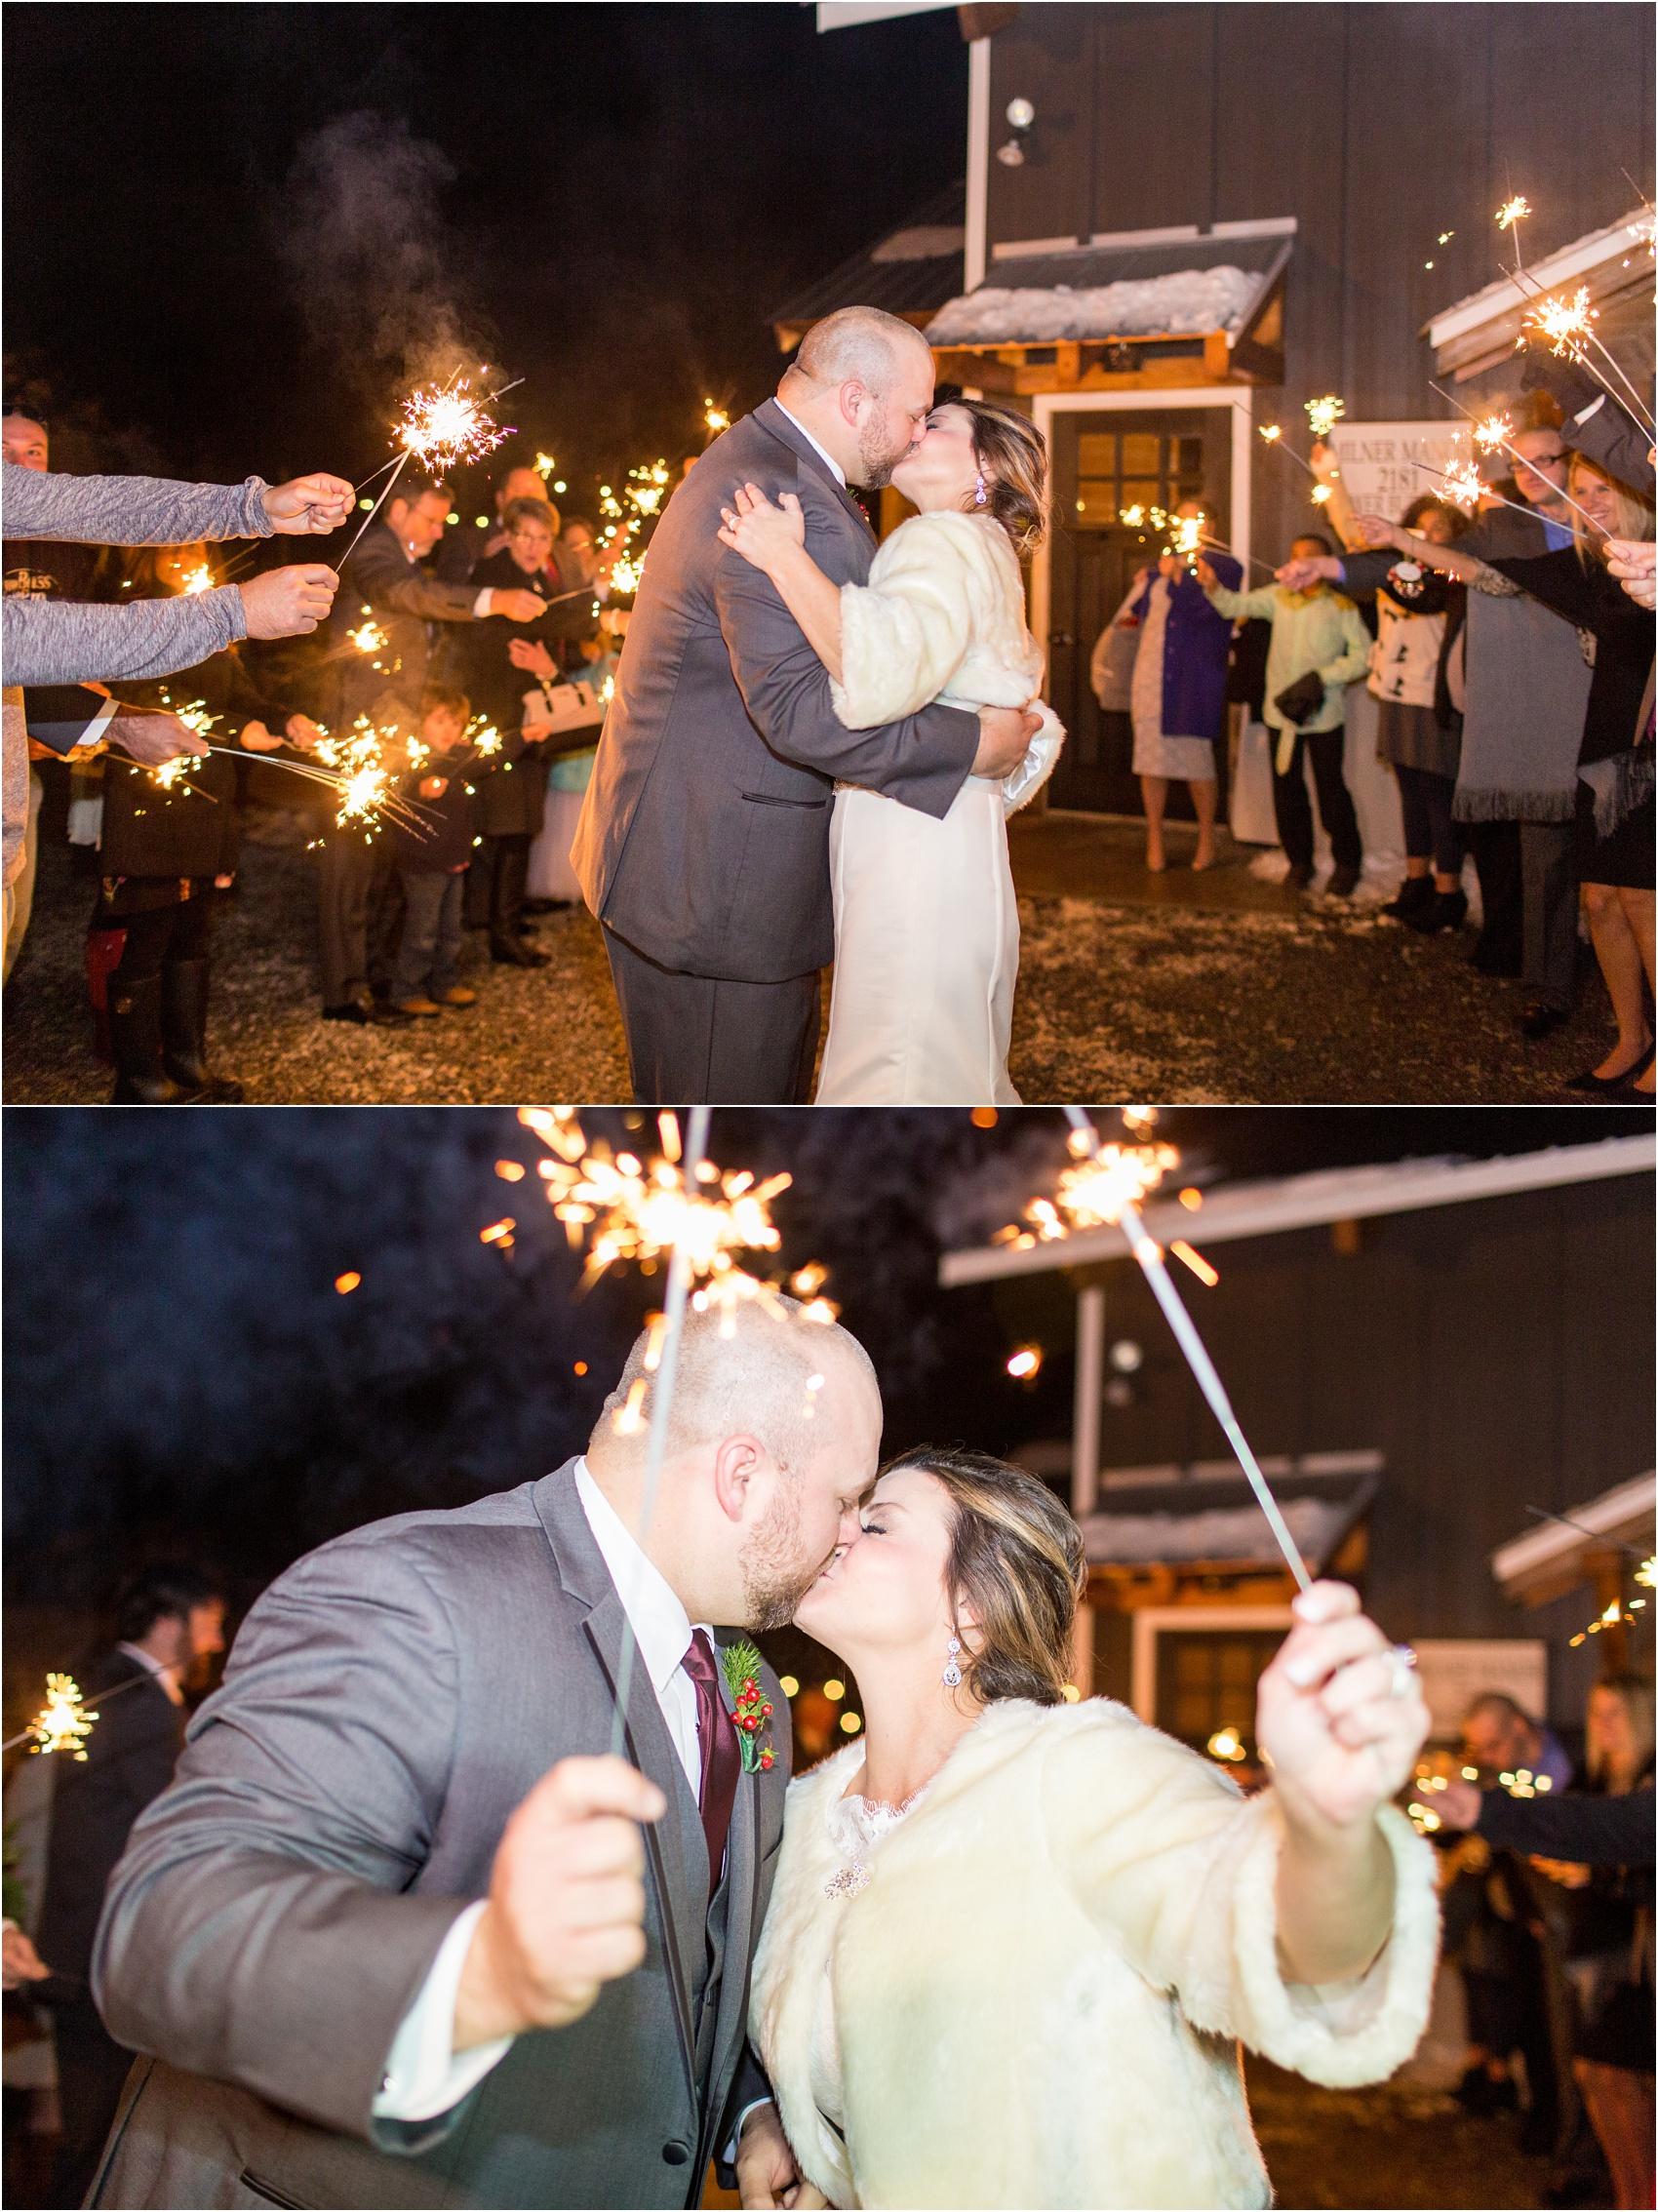 Savannah Eve Photography- Page Wedding Blog-100.jpg